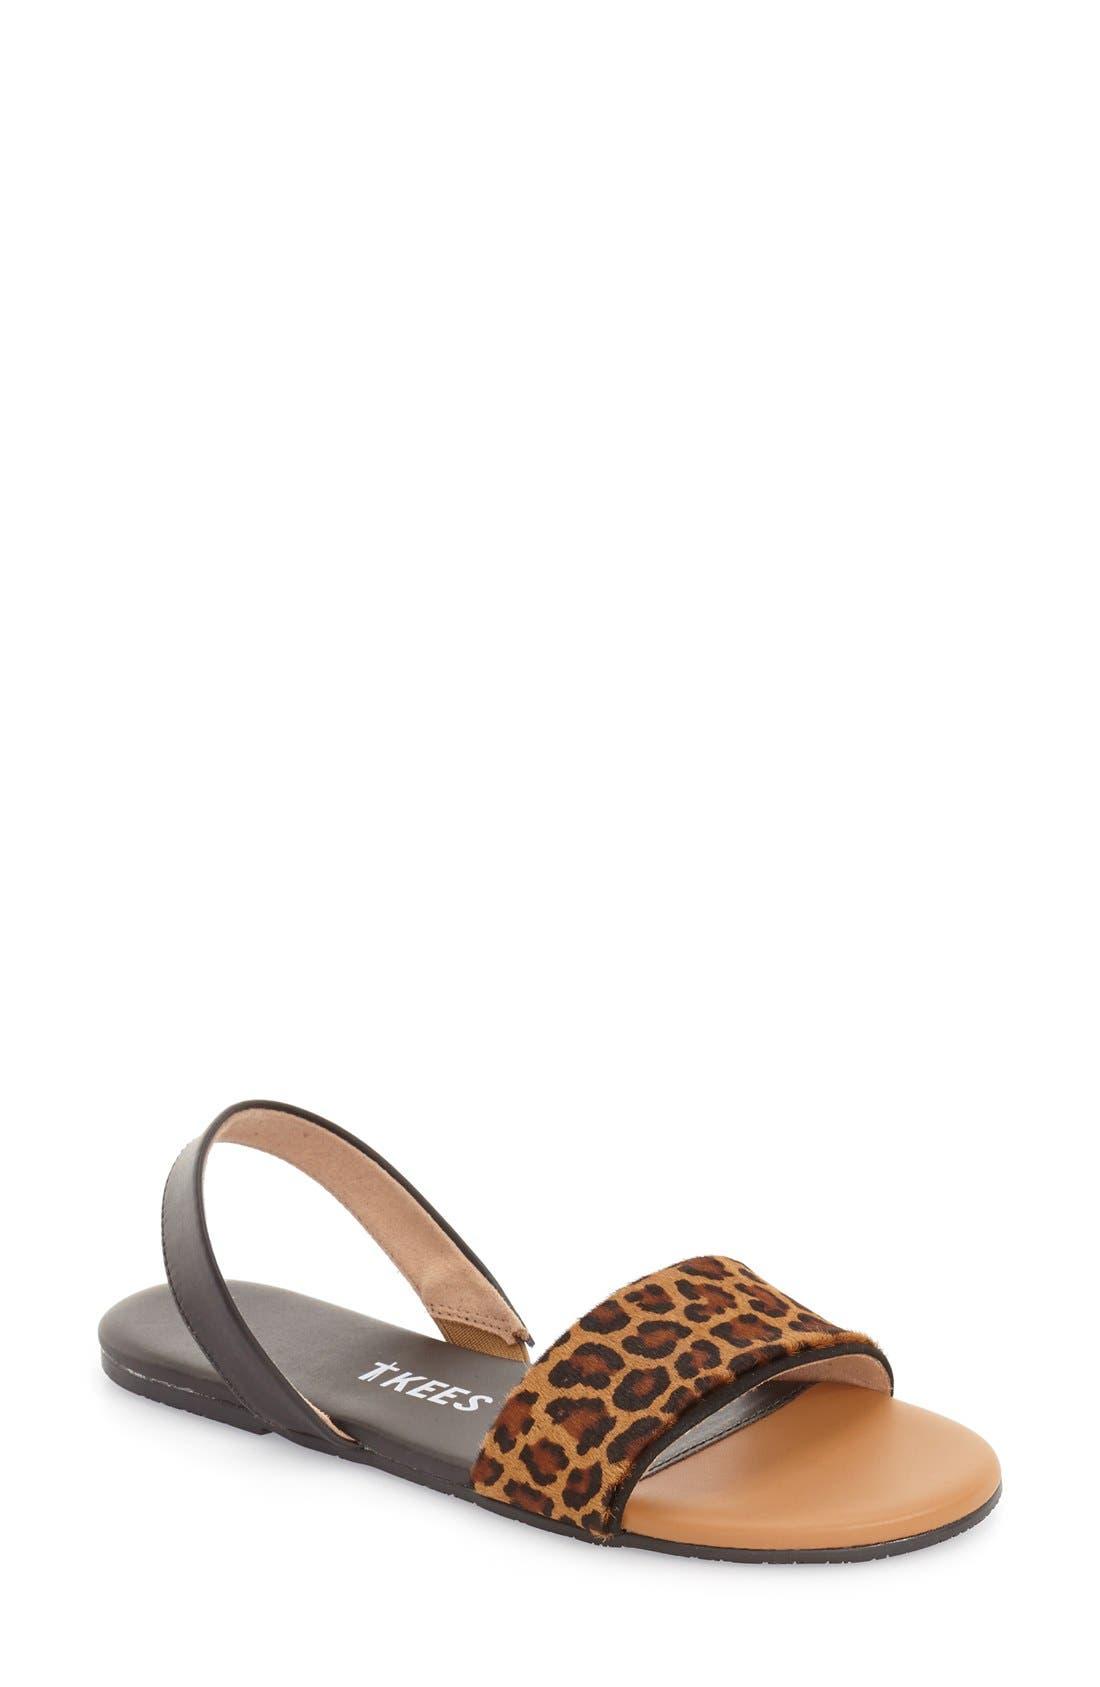 'The Charlie' Slingback Sandal, Main, color, 005